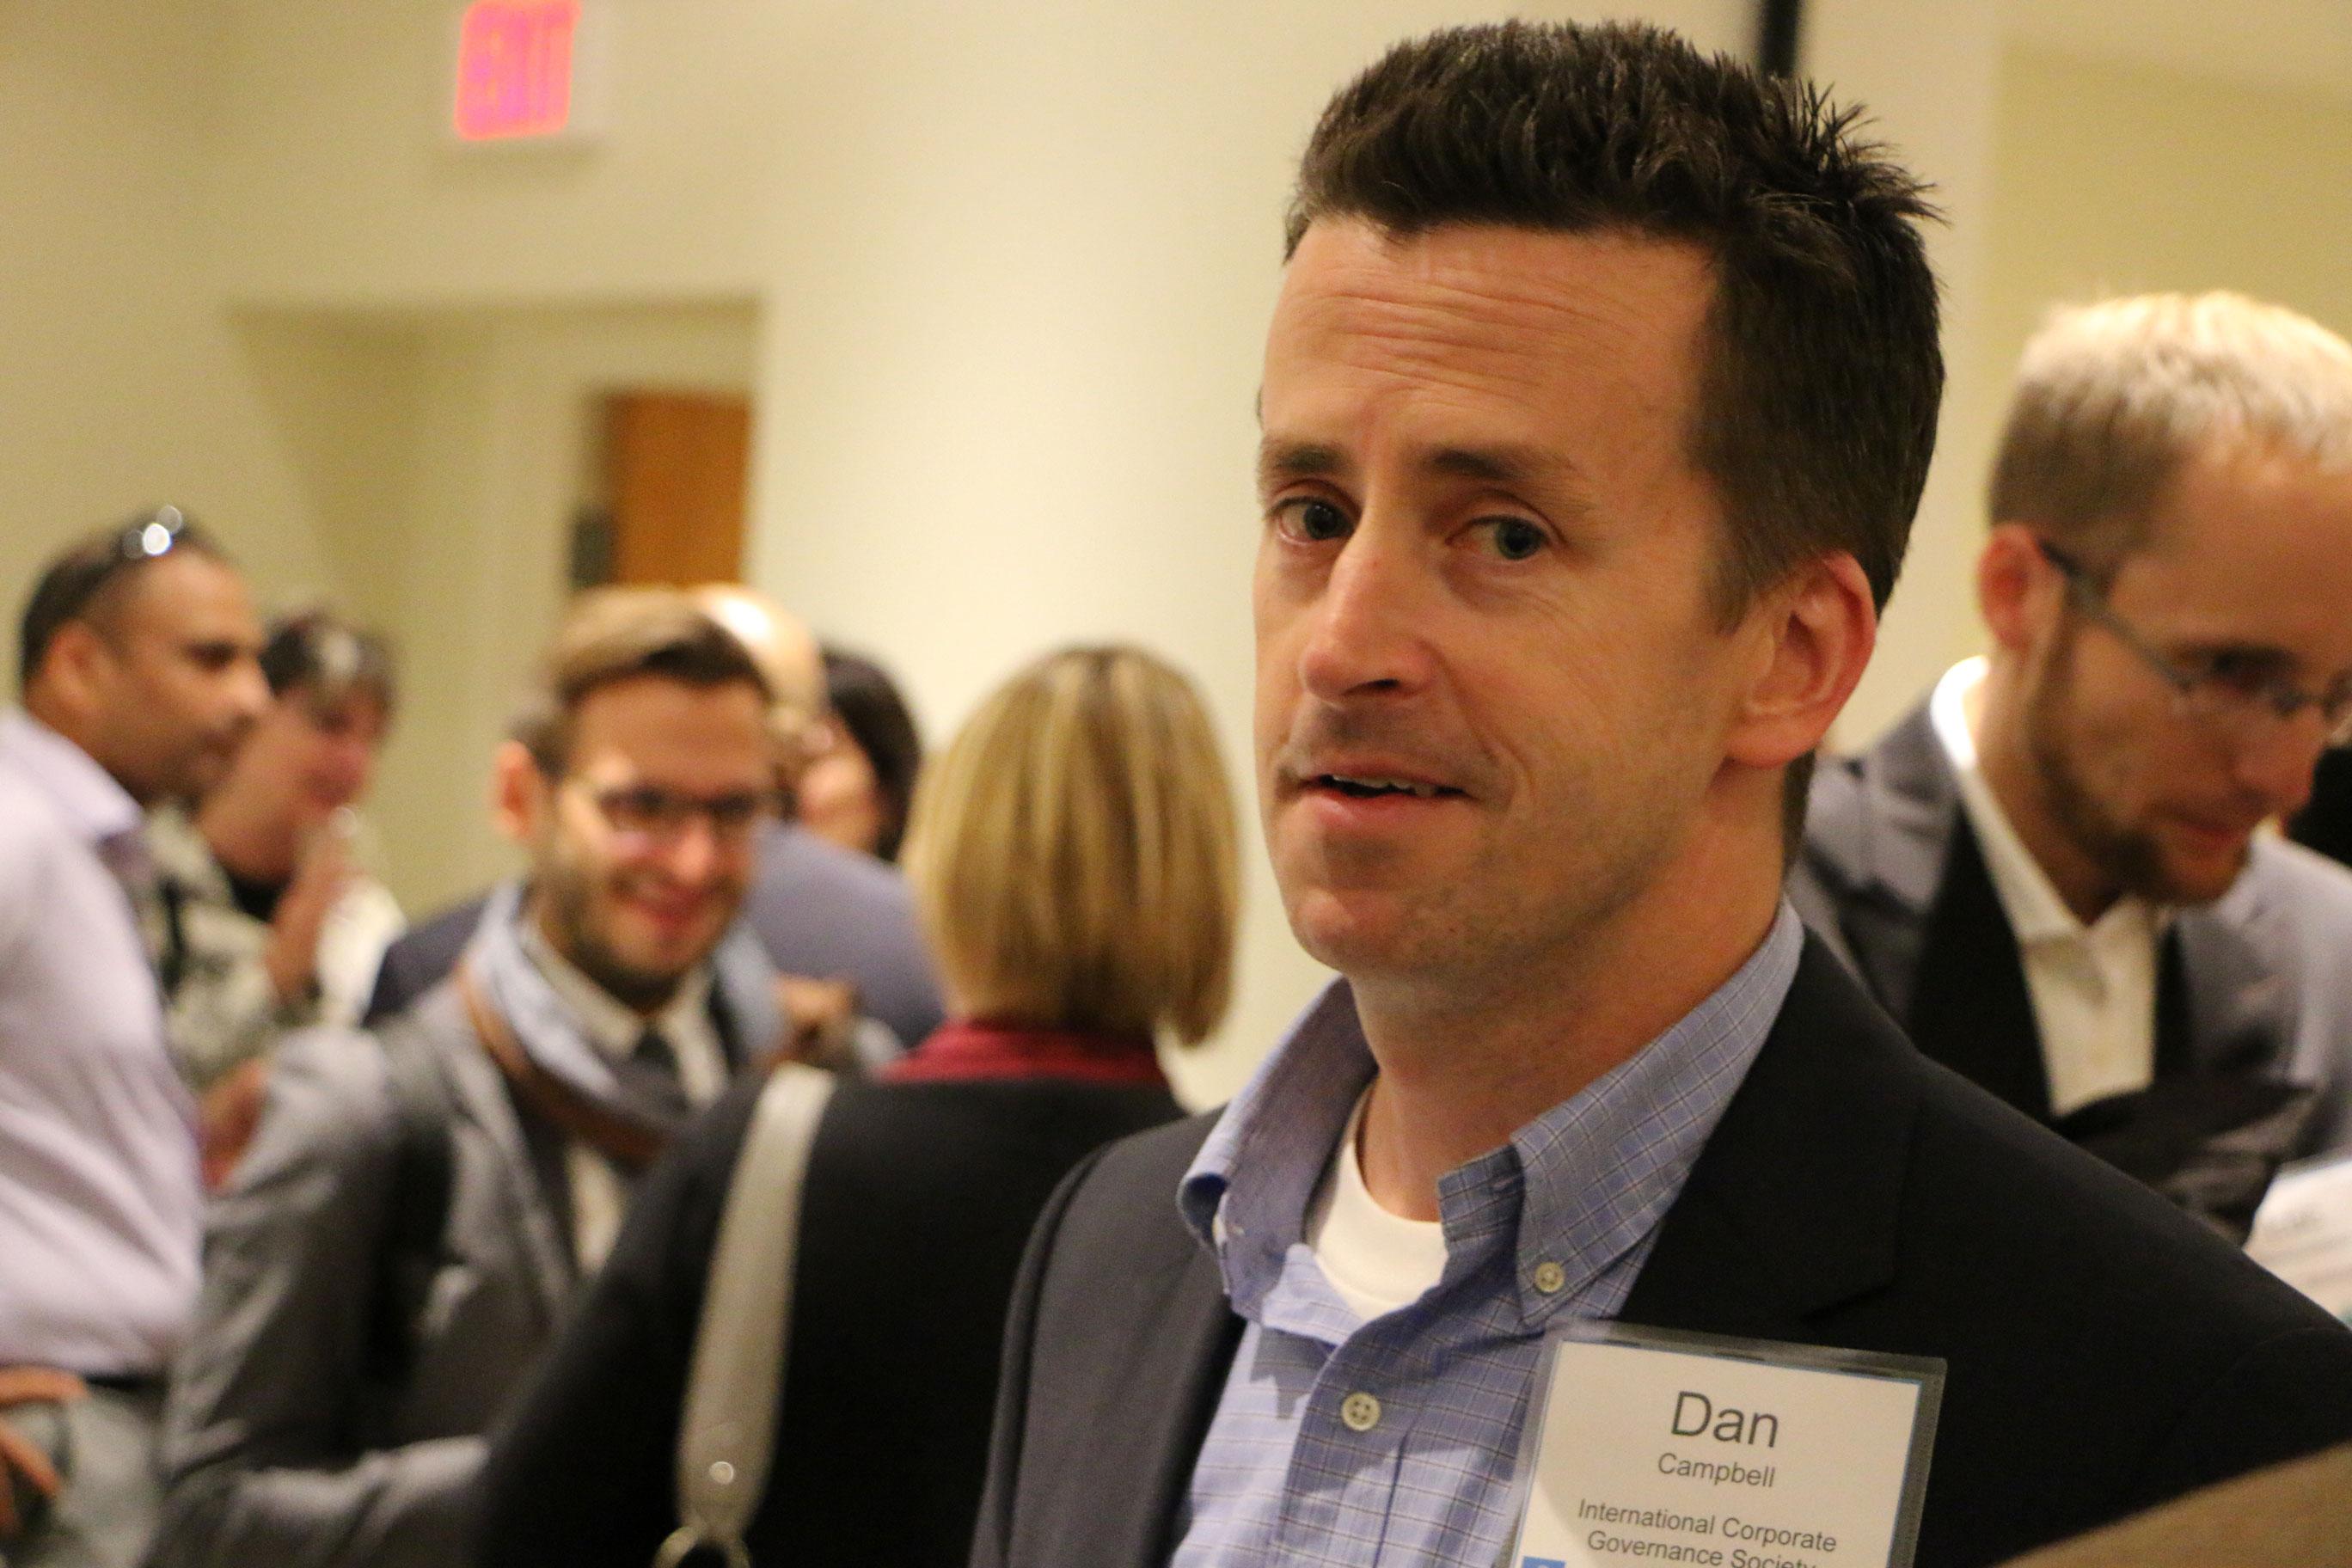 Executive Director Daniel Campbell